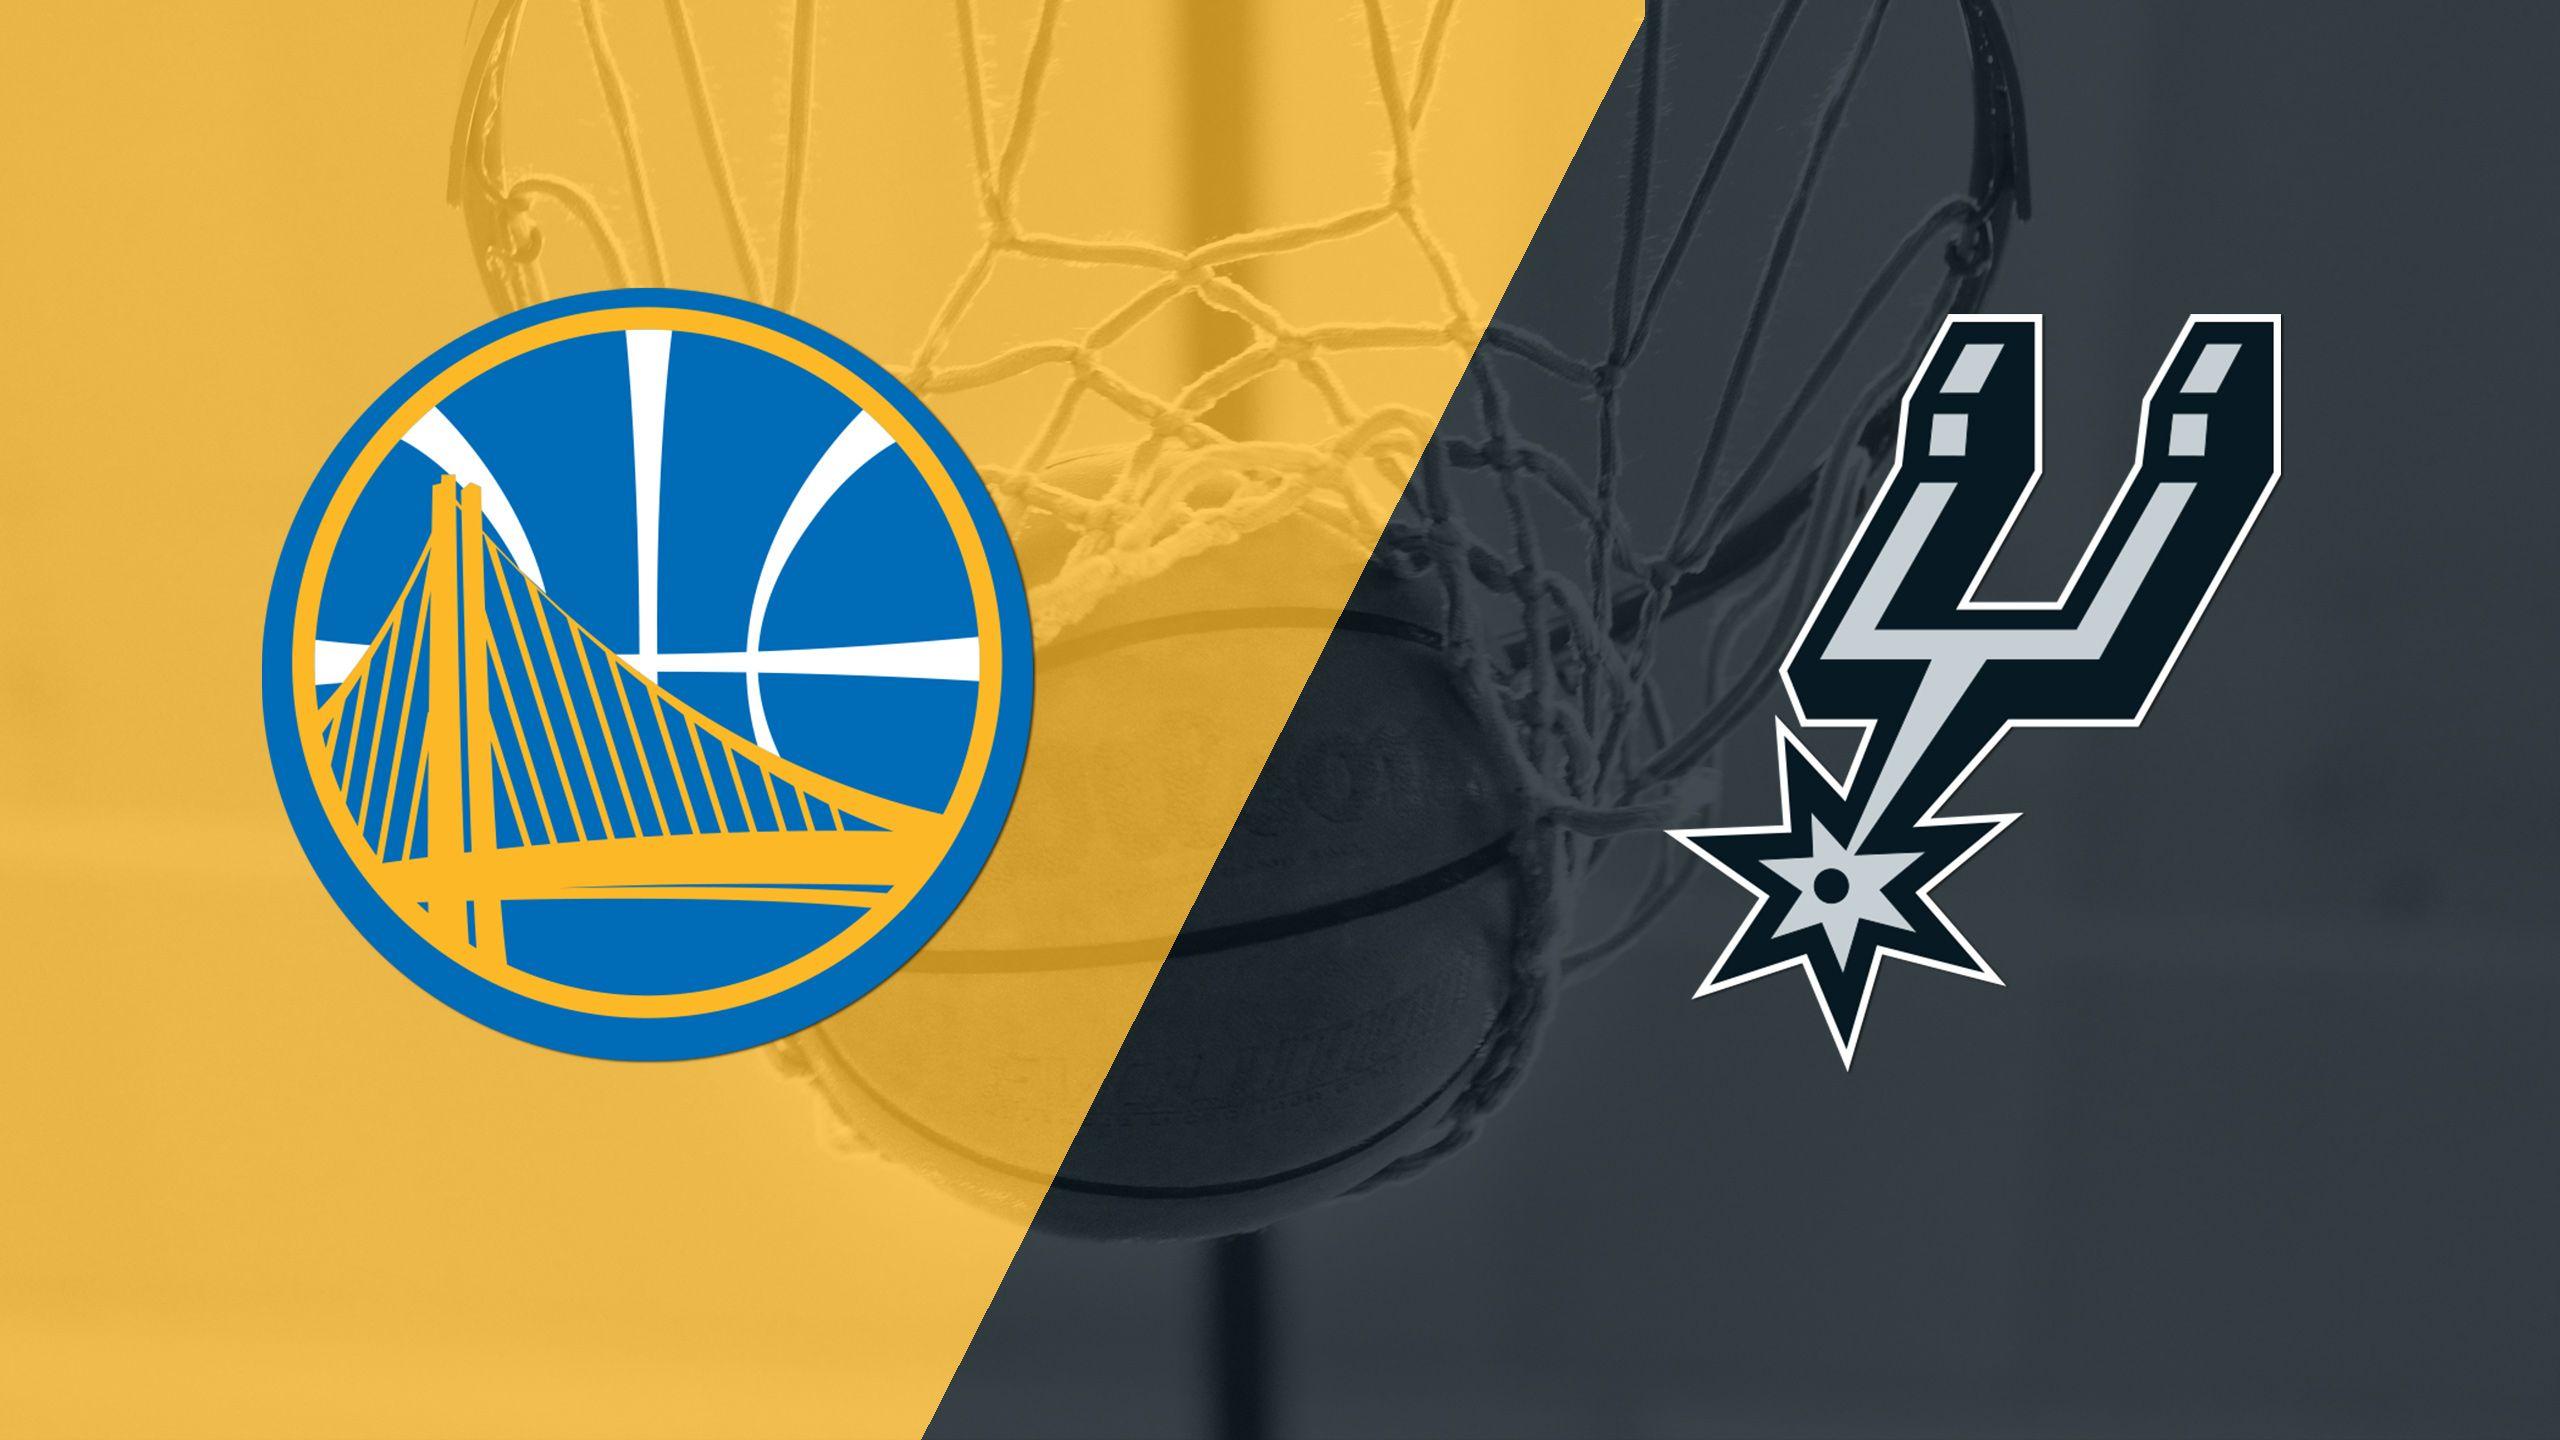 Data Center - Golden State Warriors vs. San Antonio Spurs (Conference Finals Game 3)